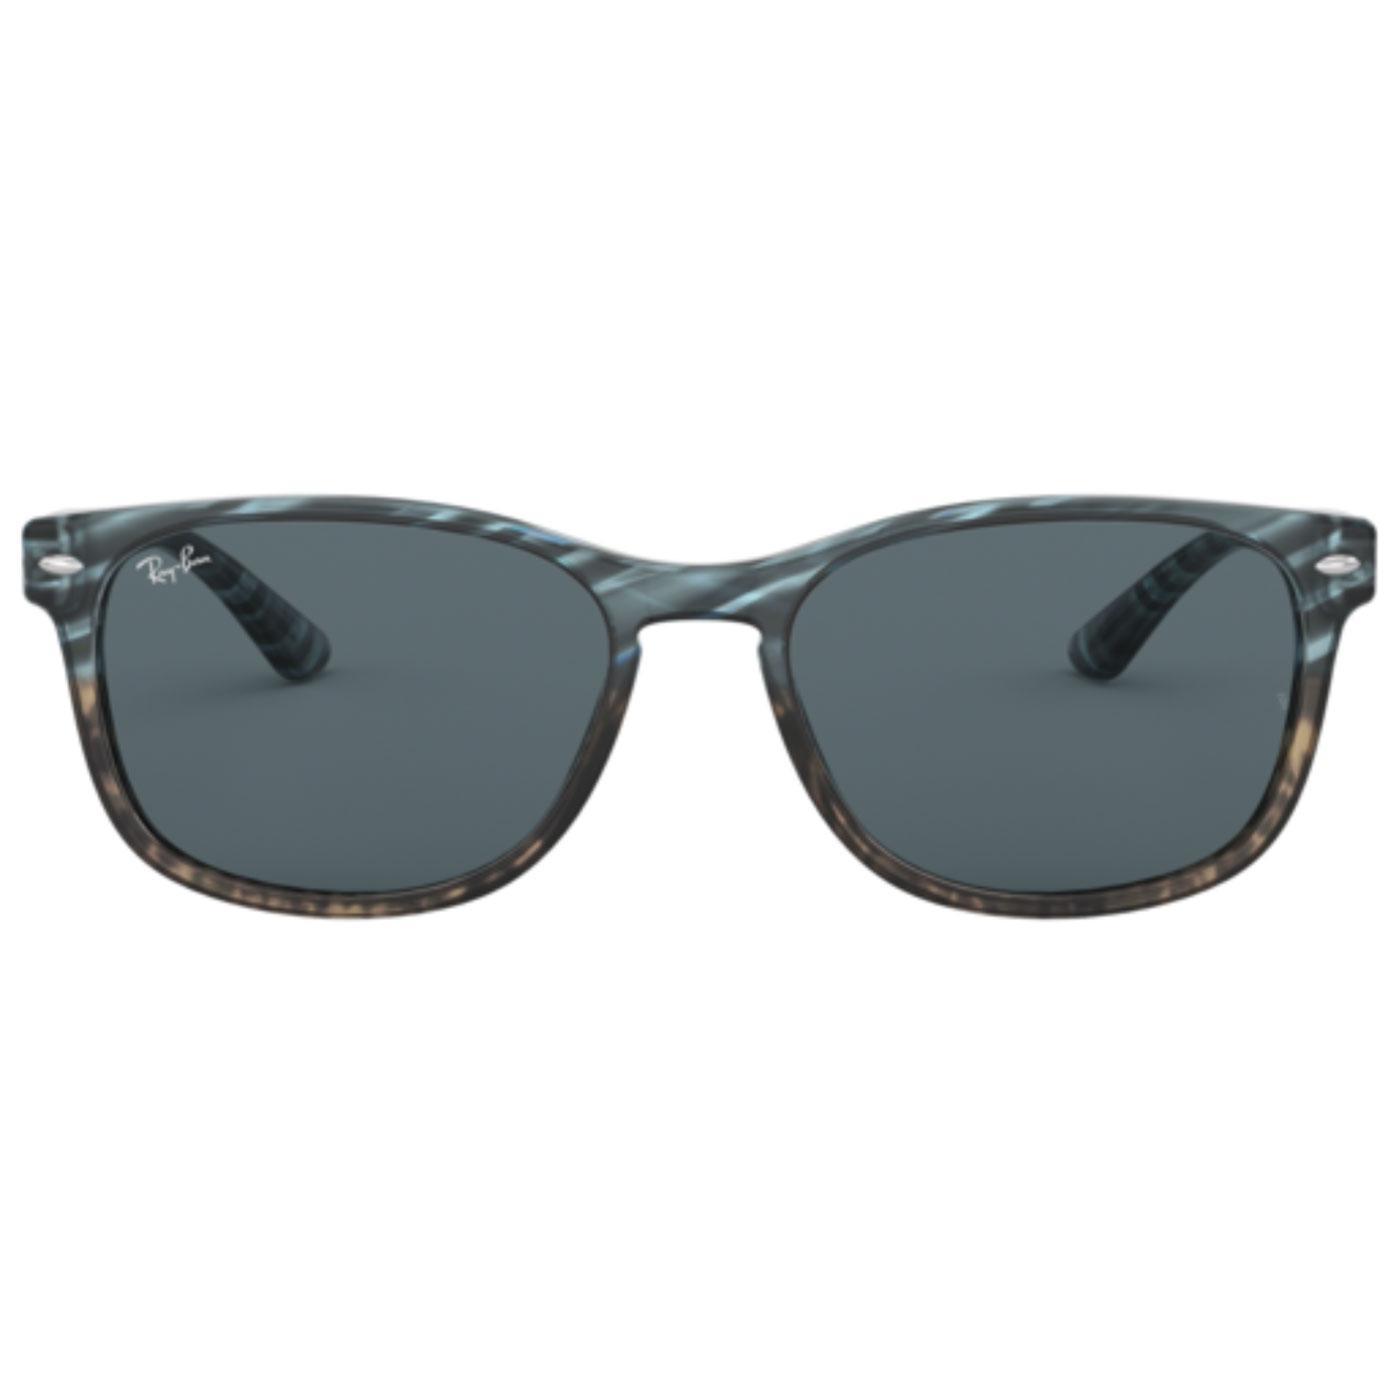 RAY-BAN Retro 80s Striped Wayfarer Sunglasses G/B